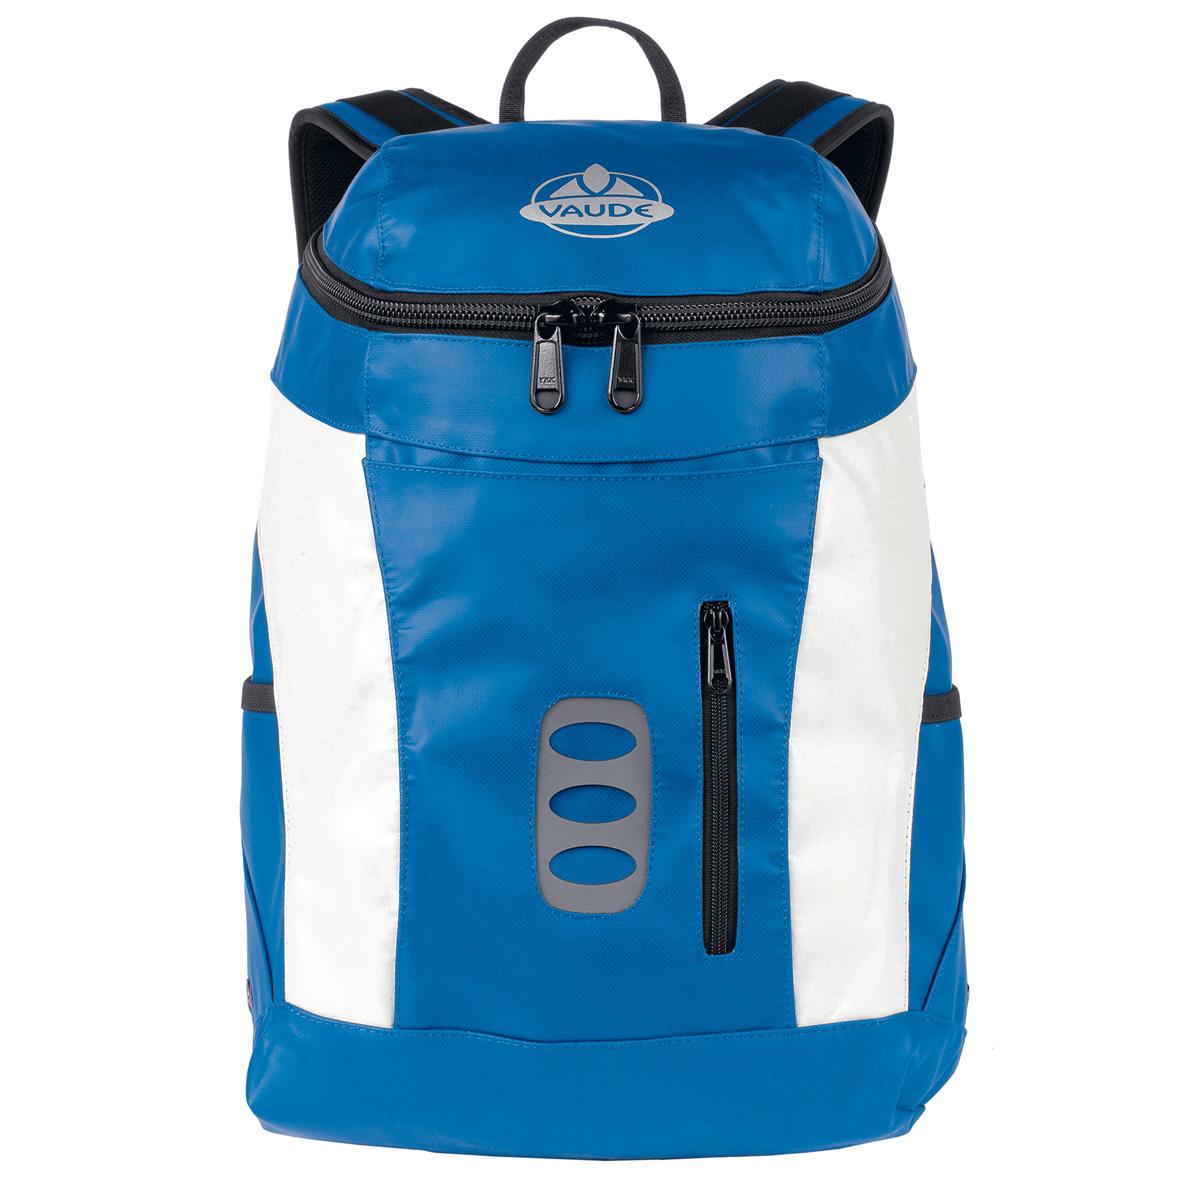 vaude xaver rucksack daypack tarpolin lkw plane blau ebay. Black Bedroom Furniture Sets. Home Design Ideas